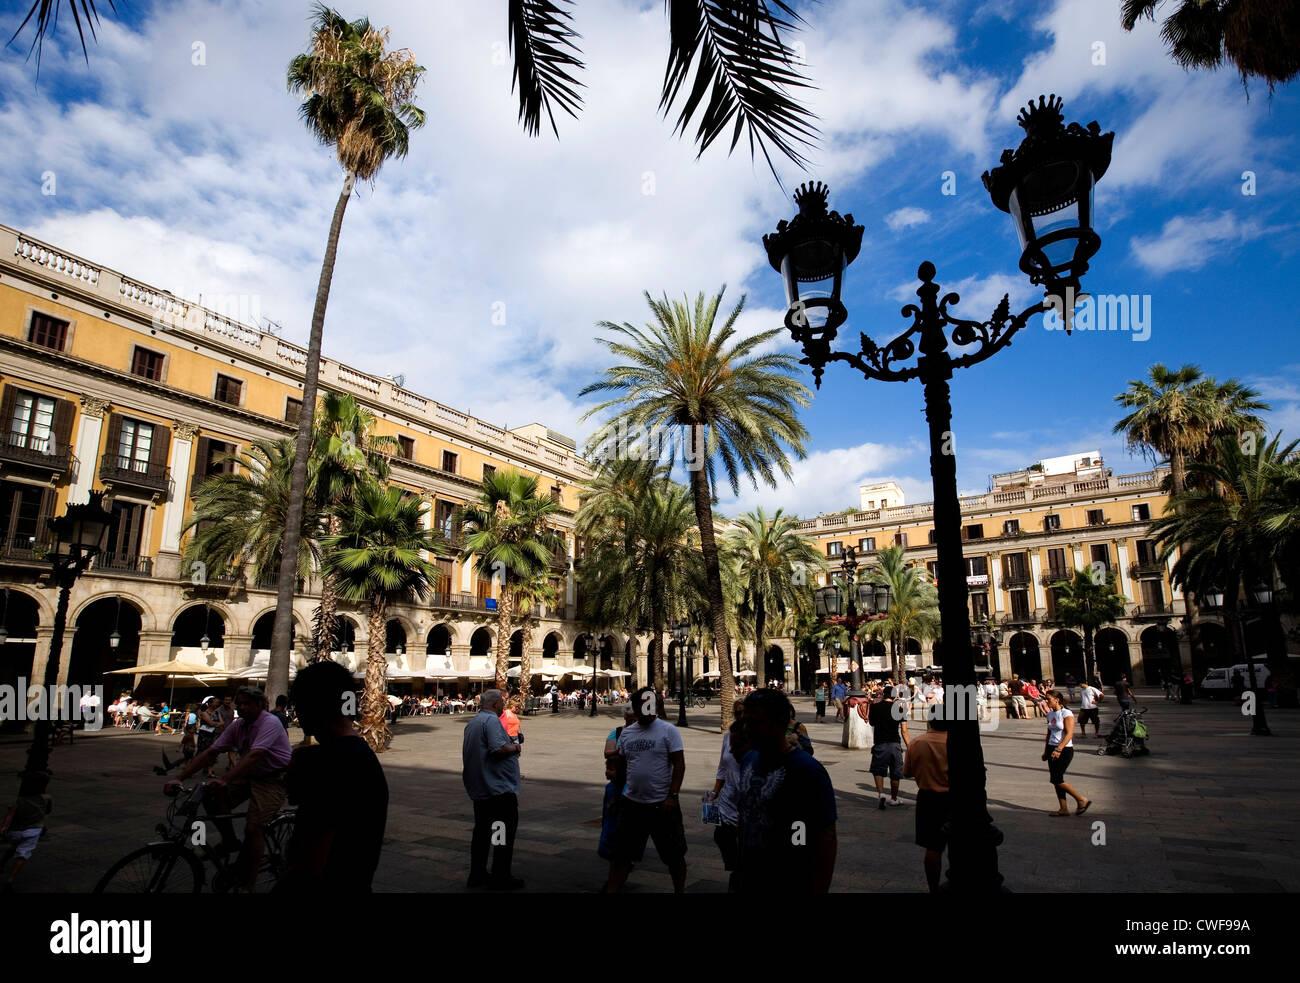 Placa Reial, Barcelona, Catalonia, Spain - Stock Image